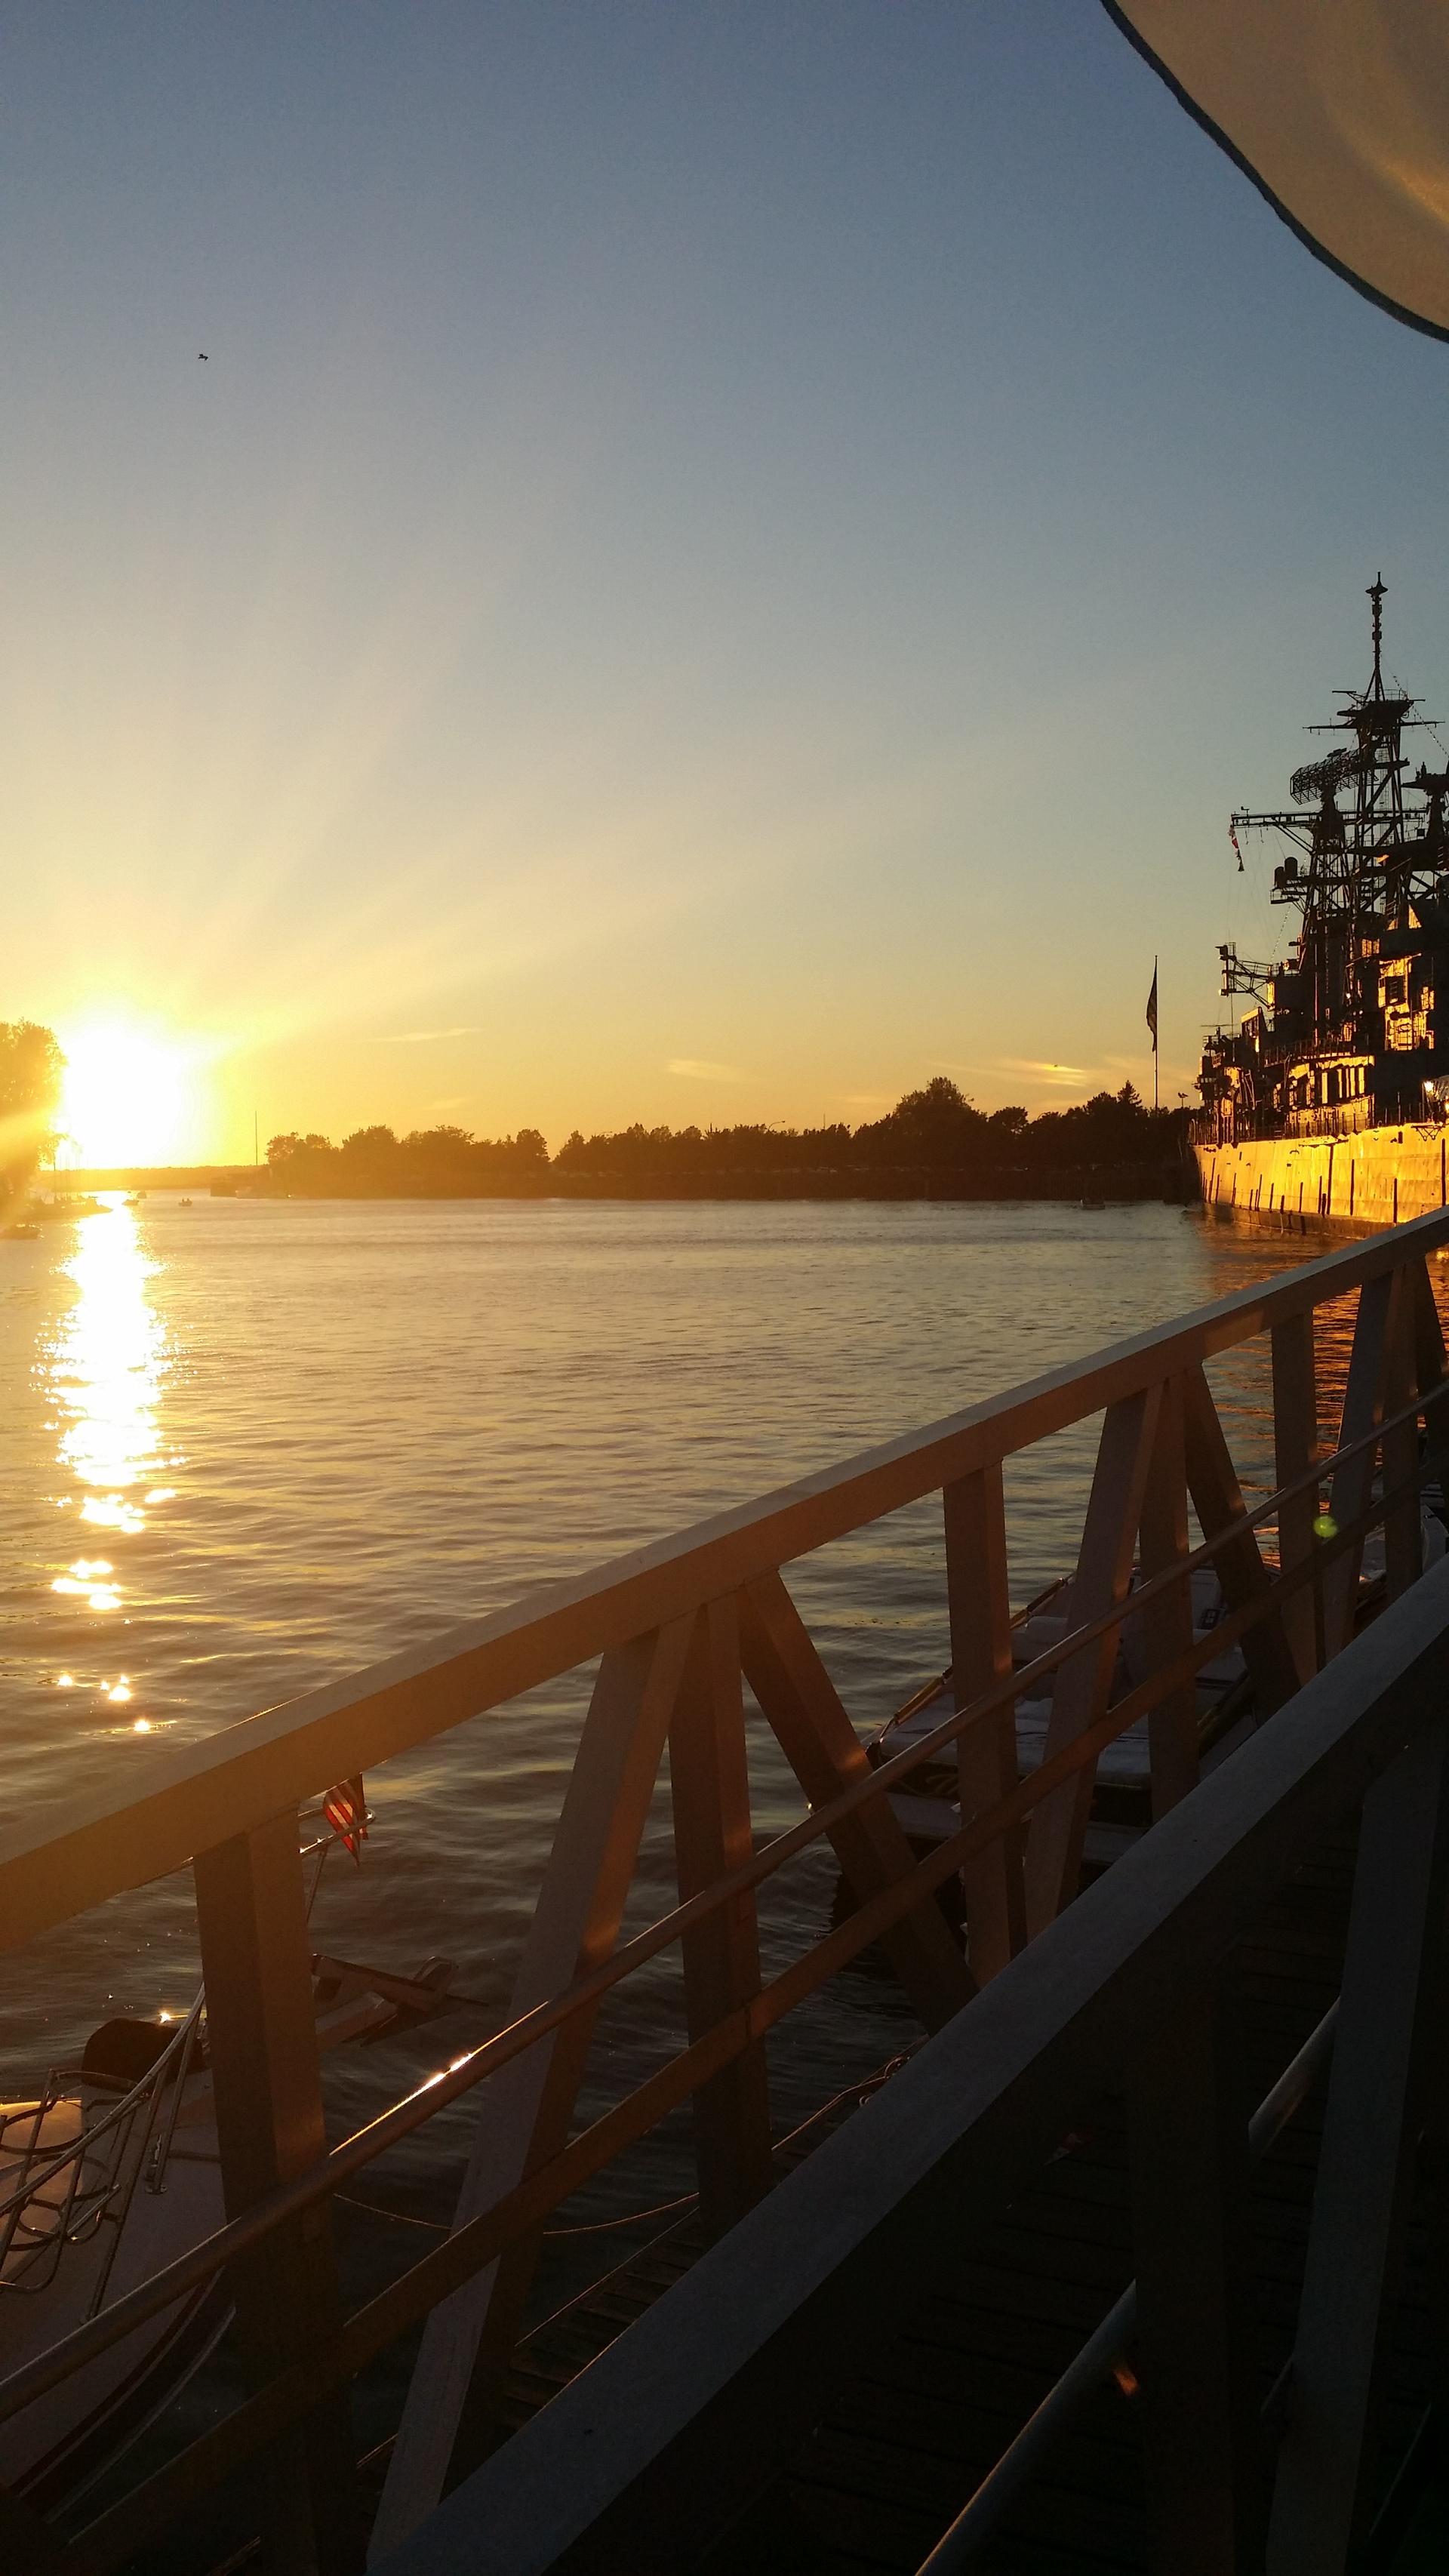 Buffalo NY   kerrik08, marina water lake erie, water navy ship, sunset navy flag